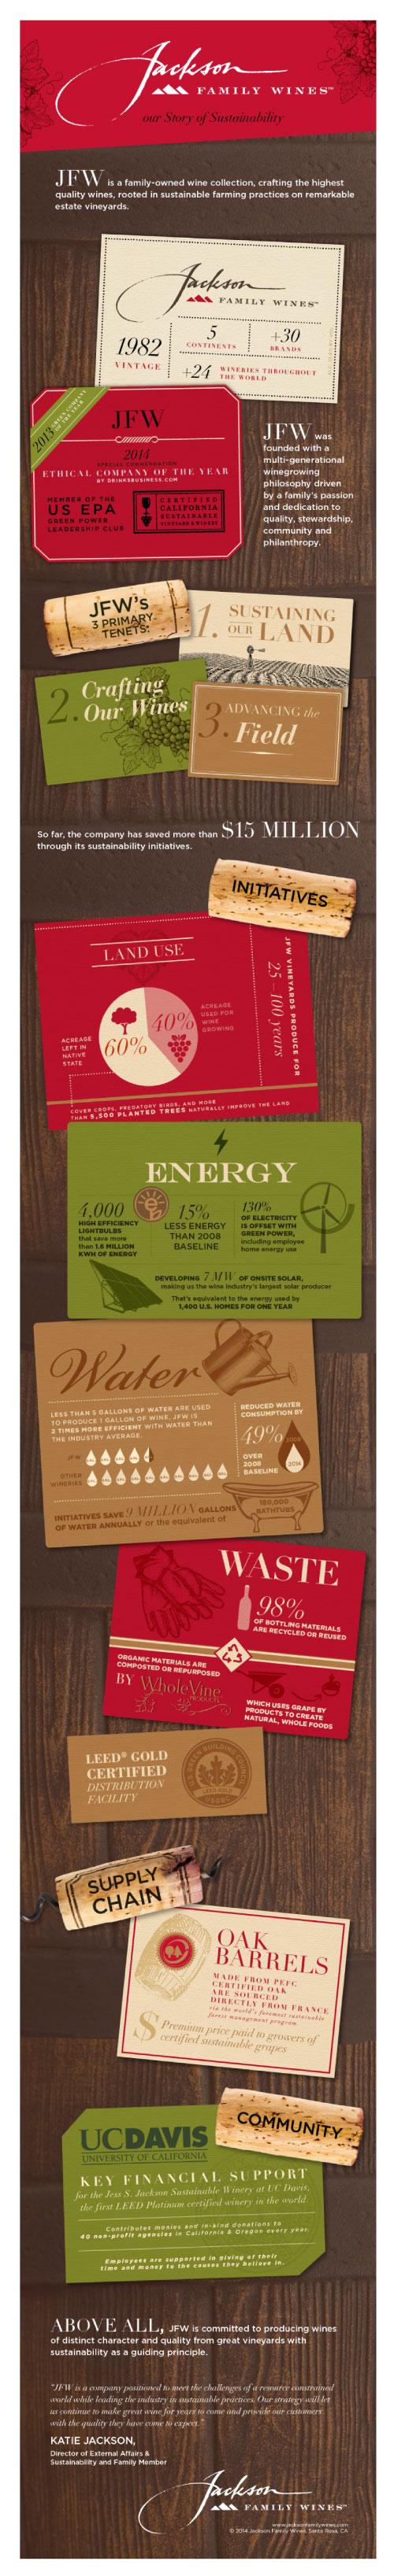 JFW_infographic_new.jpg